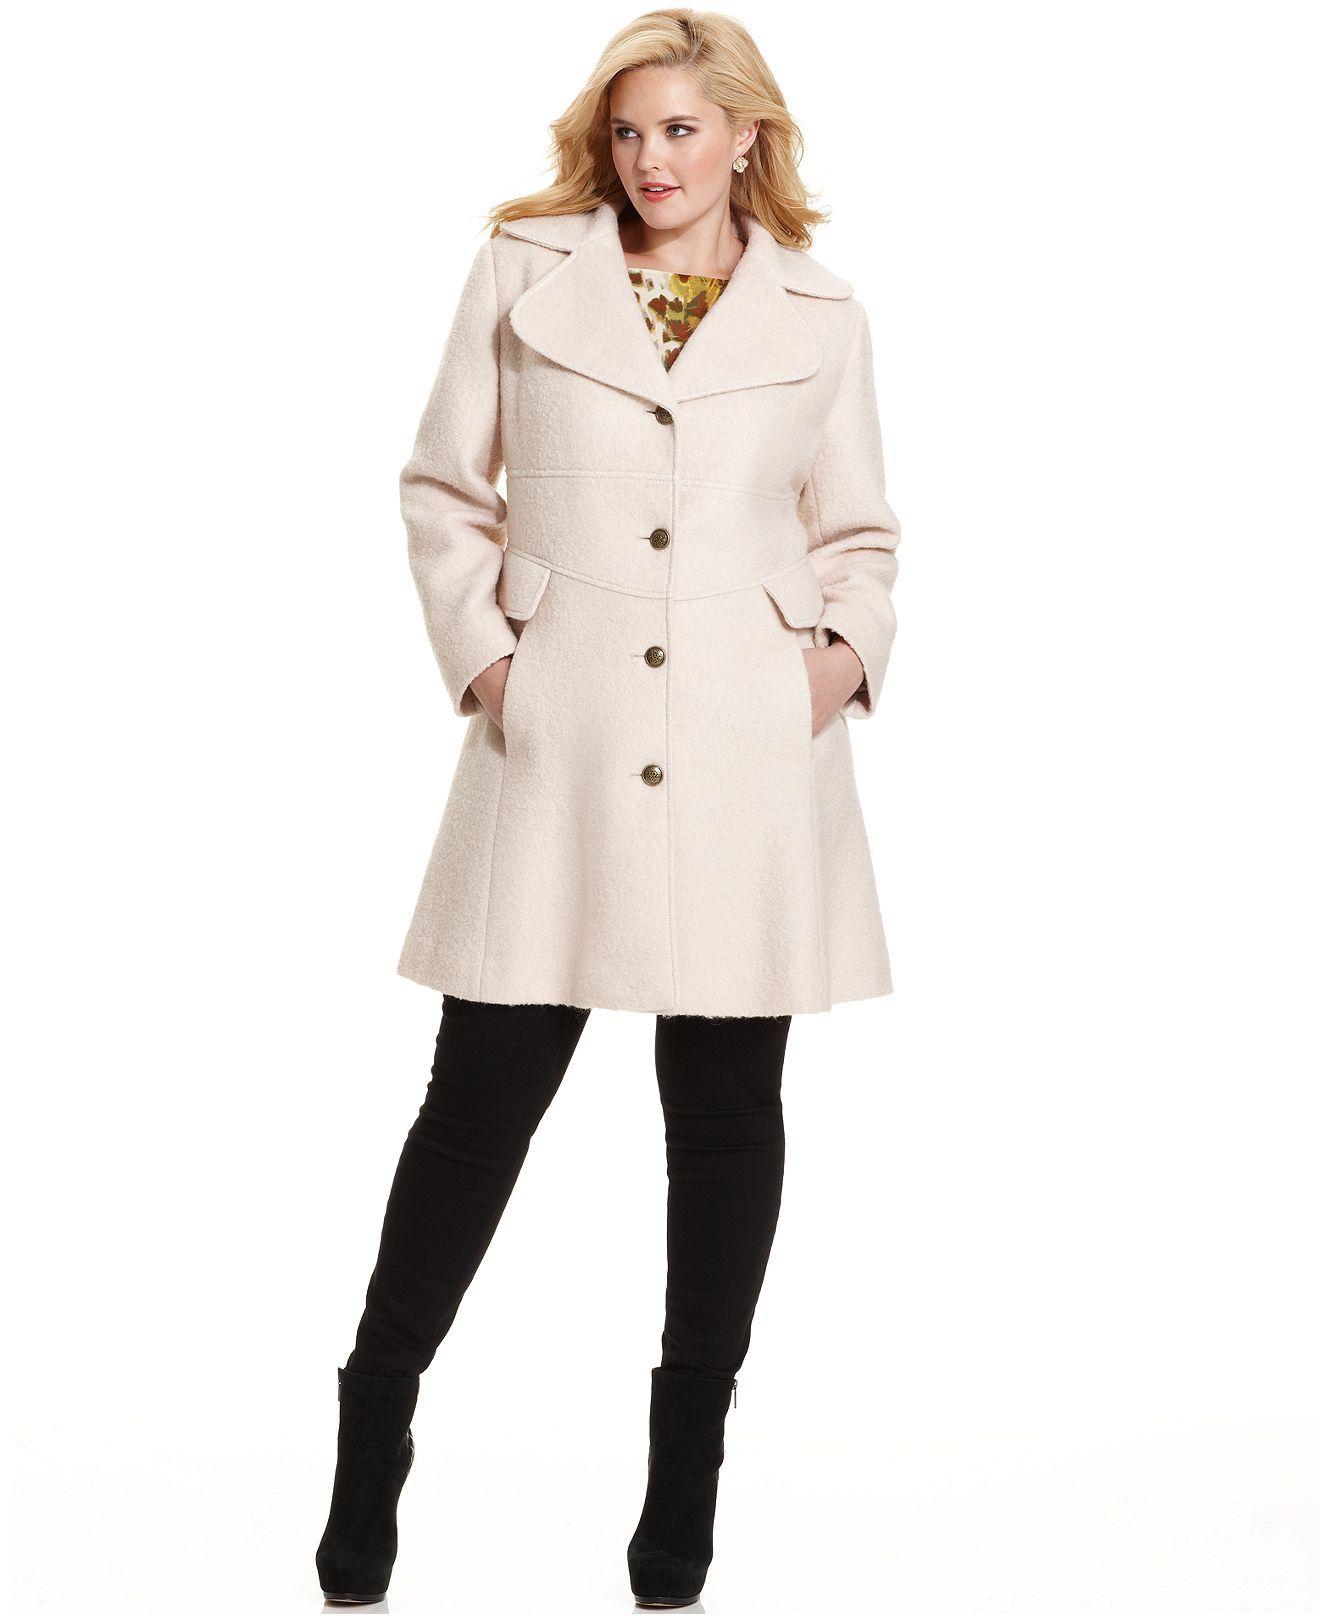 Jessica Simpson Plus Size Coat Boucle Flared Walker Womens Coats Macy S Plus Size Coats Coats For Women Plus Size Outerwear [ 1616 x 1320 Pixel ]